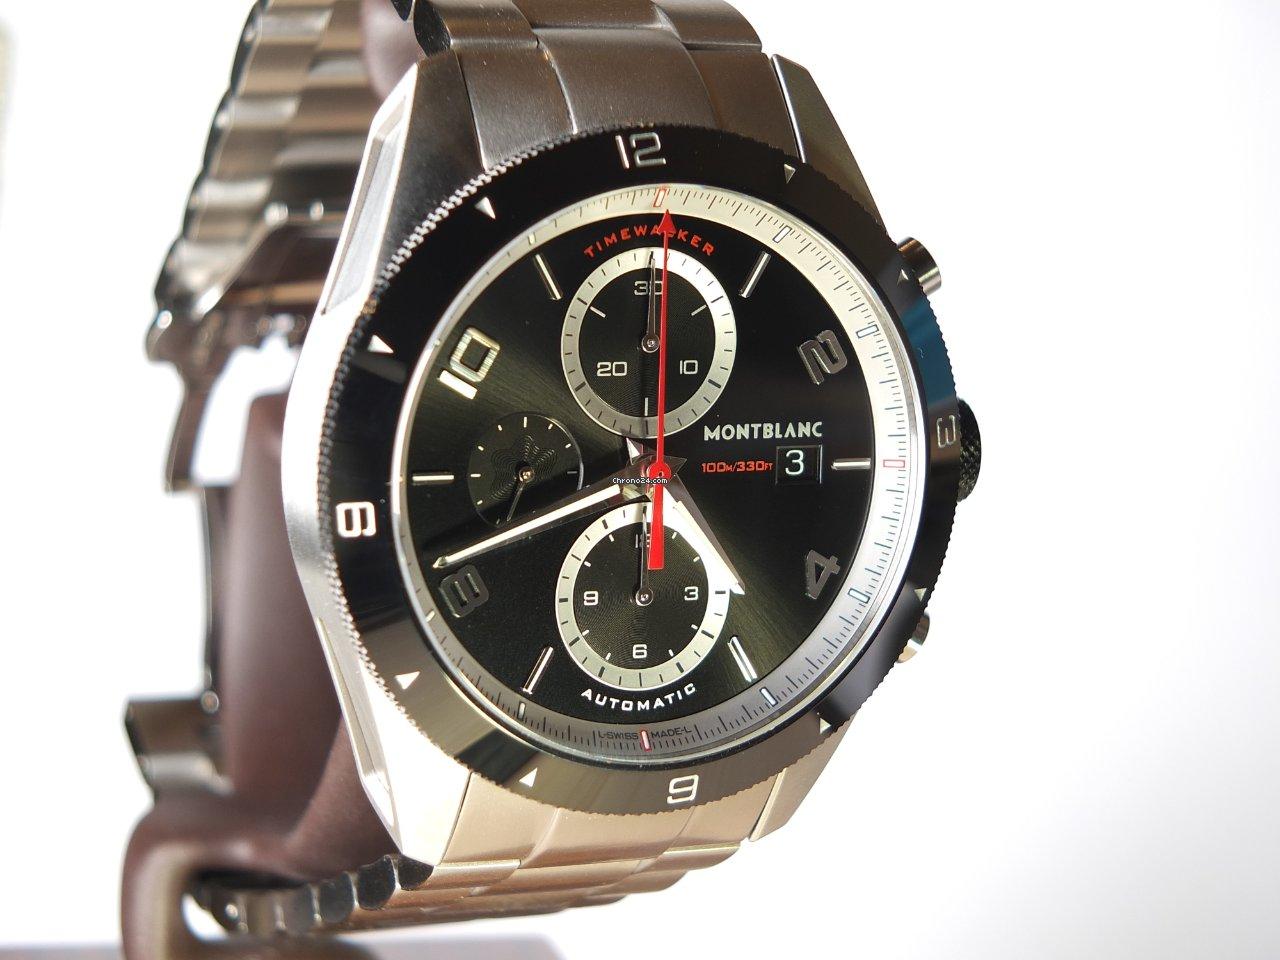 Montblanc Timewalker 116097 Montblanc Timewalker =2/2021- Neu Box & Papiere 2021 neu